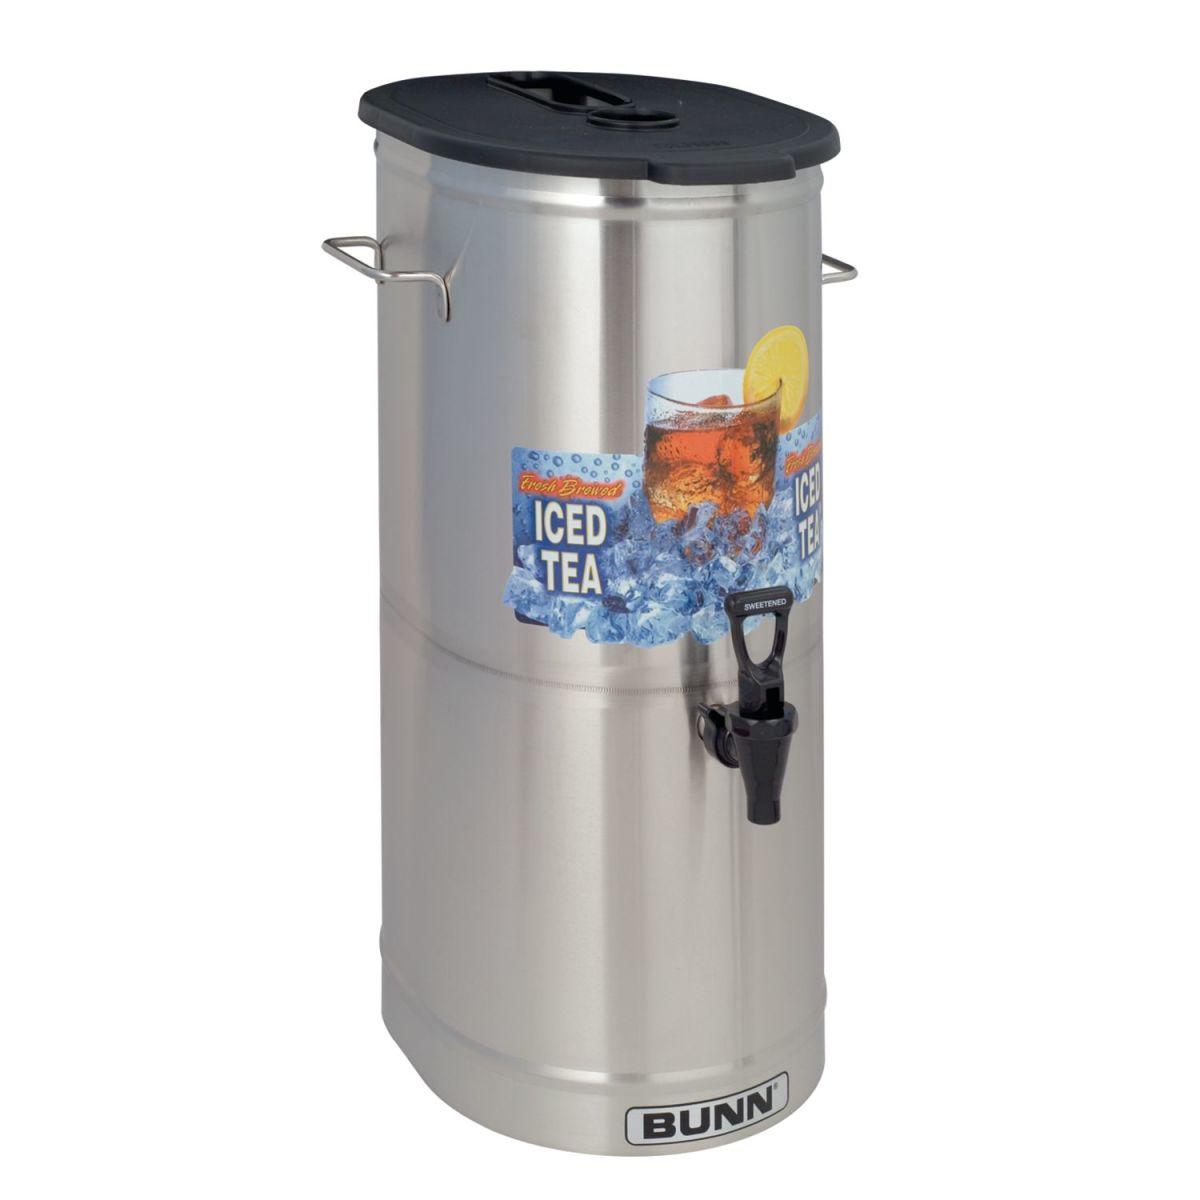 TDO-5 Dispenser w/Brew-Thru Lid